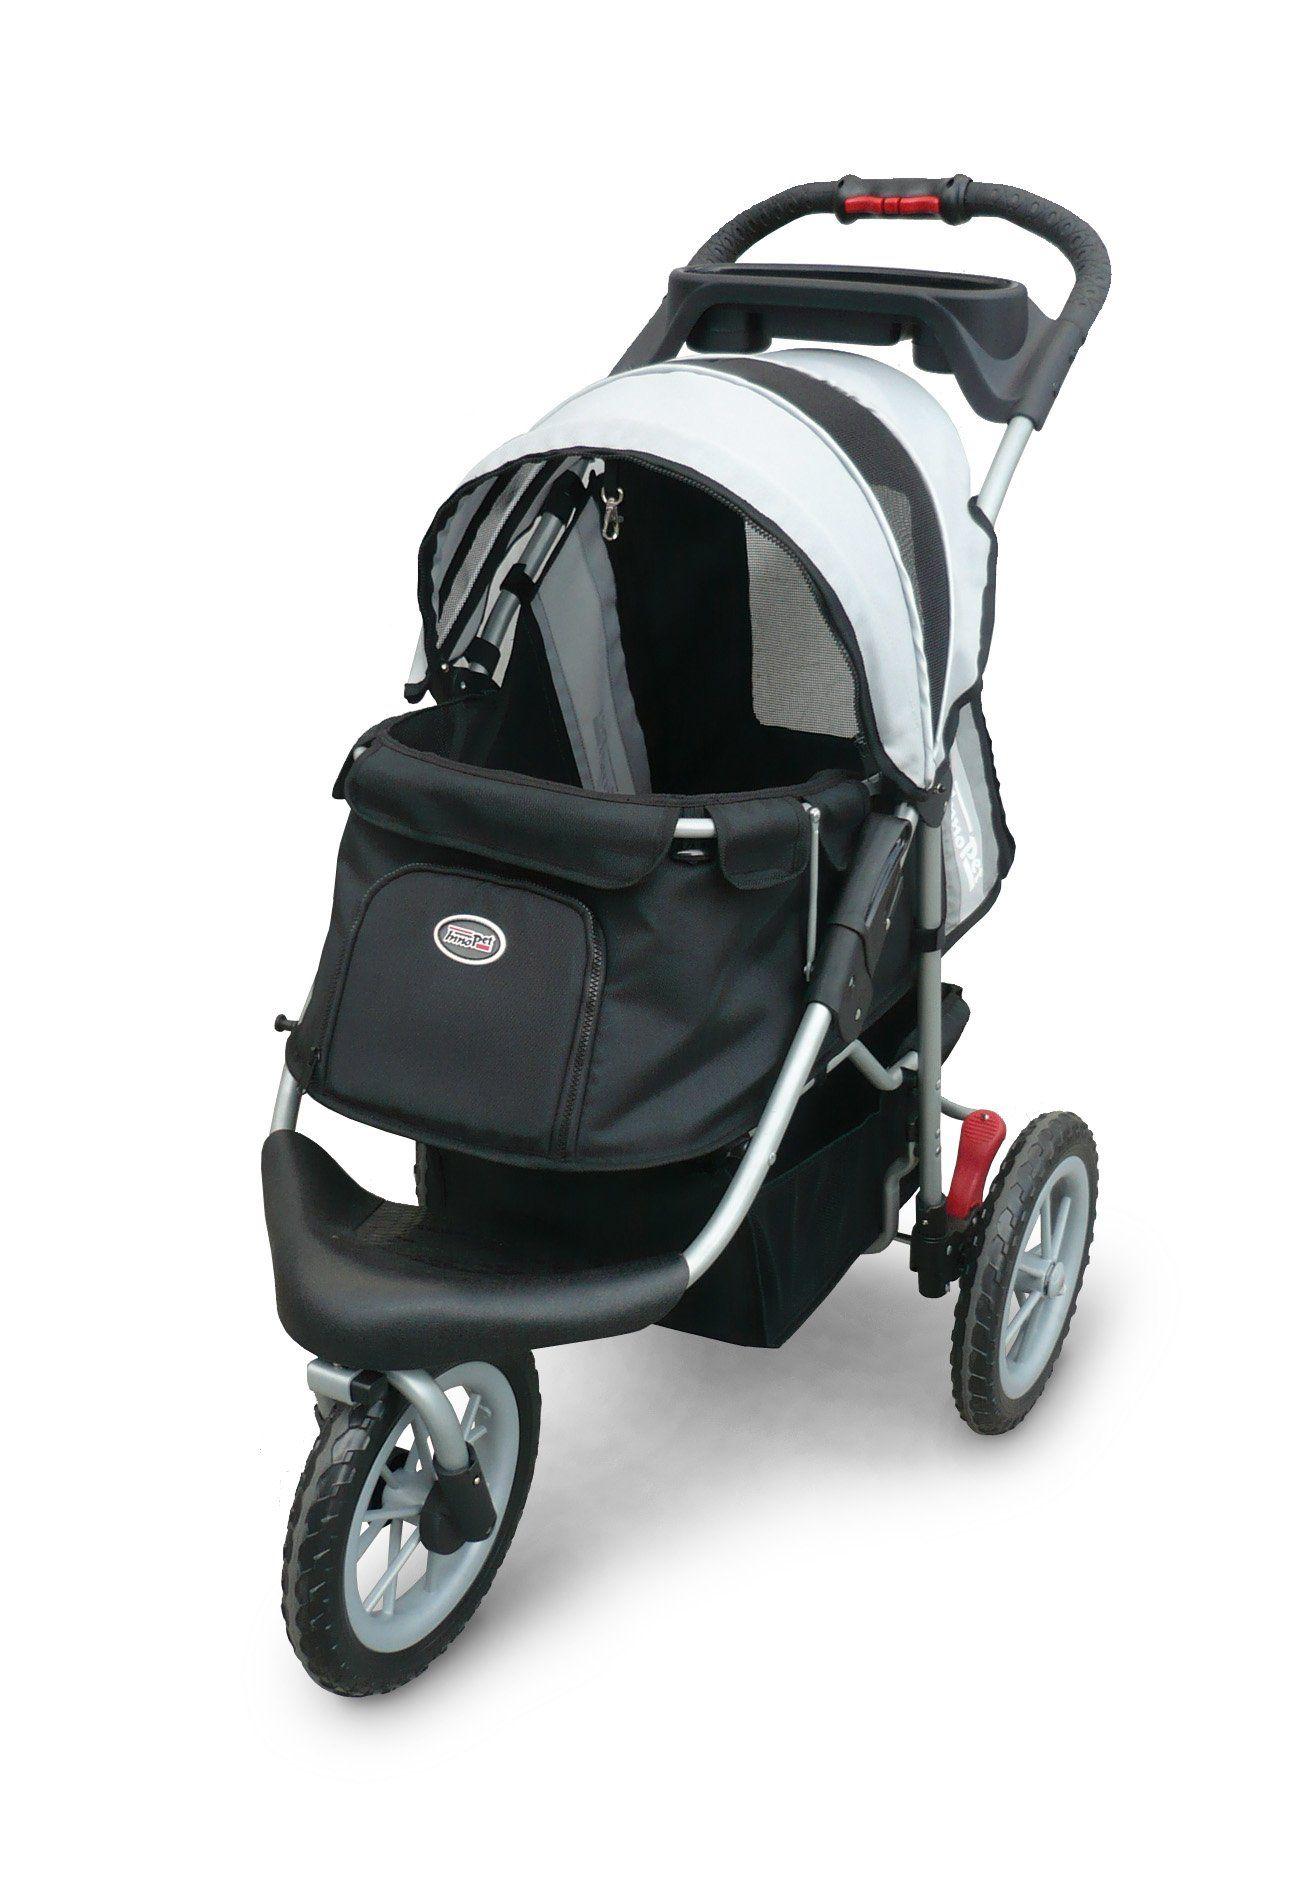 Pet Stroller,IPS070,Black/Silver, Free Rain and Wind